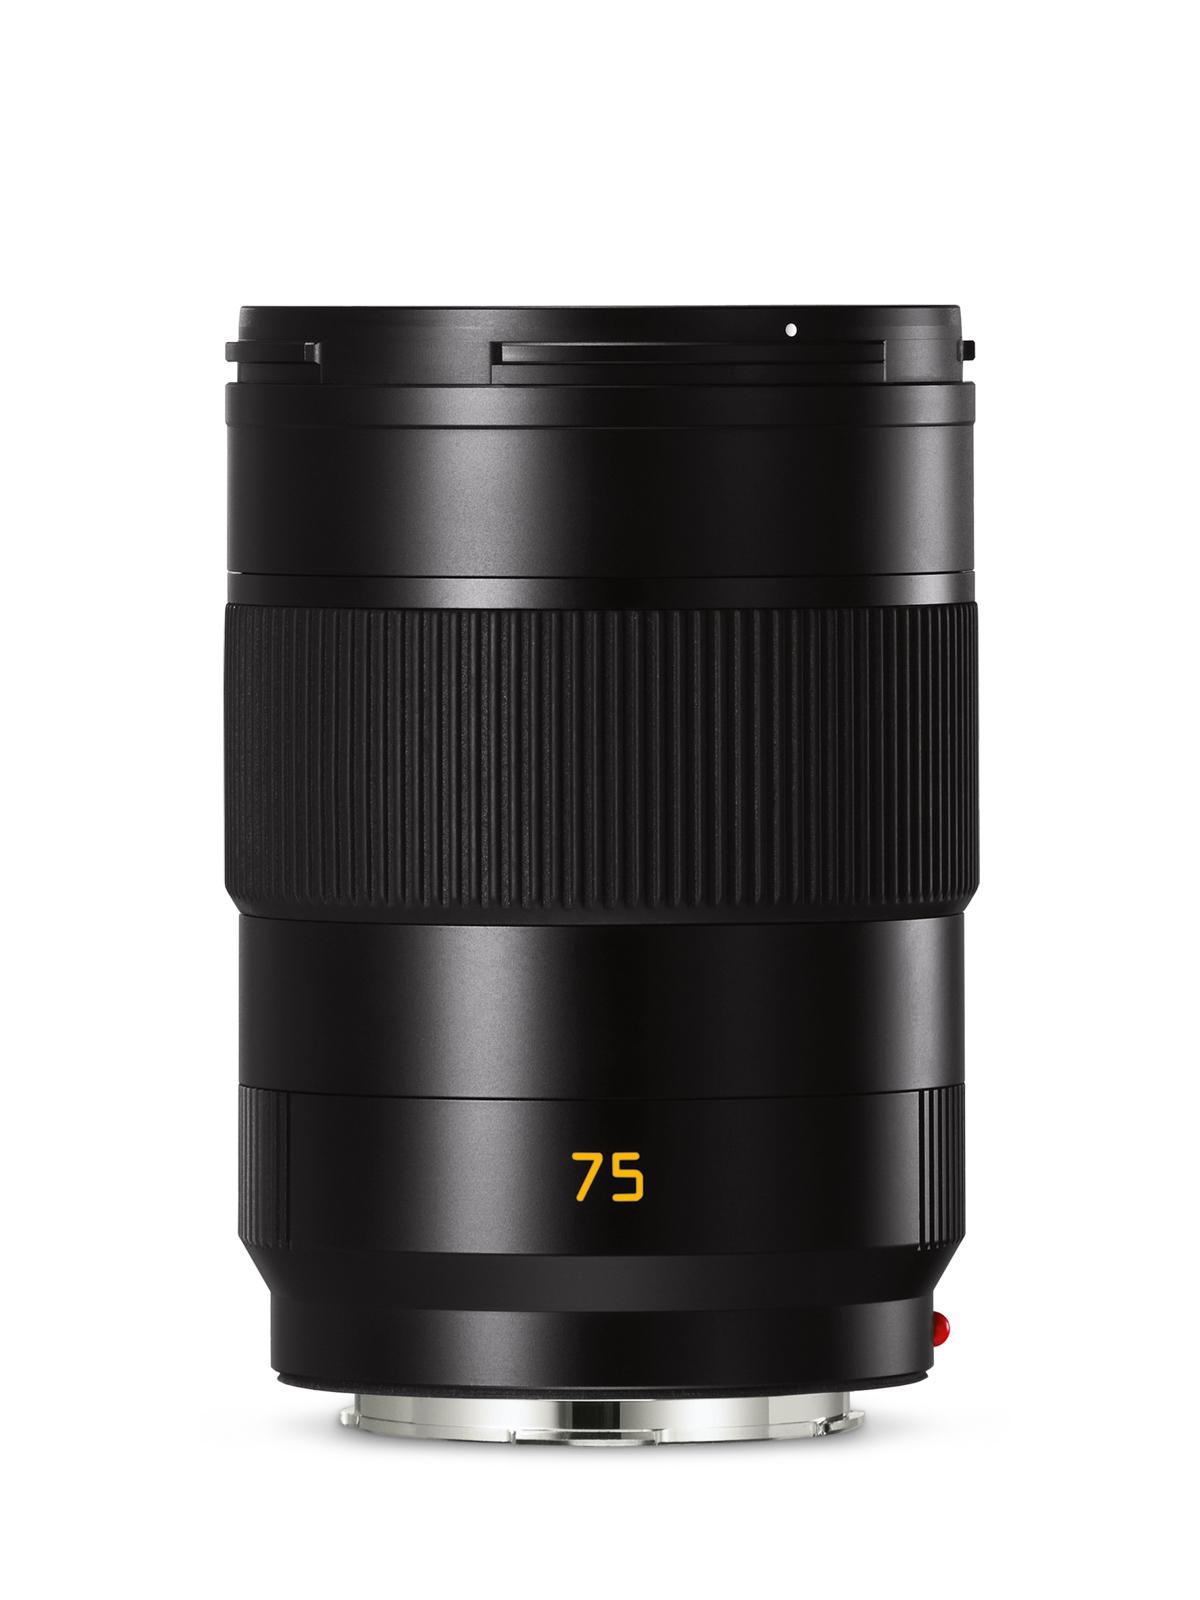 Leica APO-Summicron-SL 2.0/75 ASPH